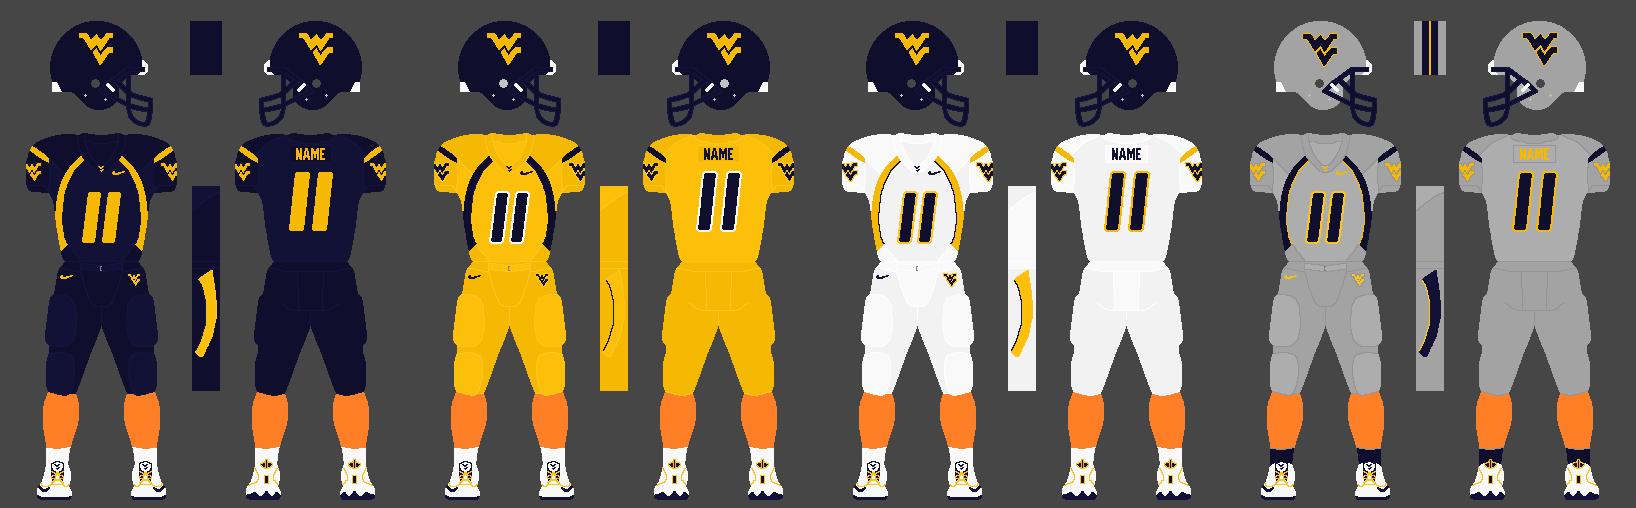 File Wvu Standard Football Uniforms Png Wikimedia Commons